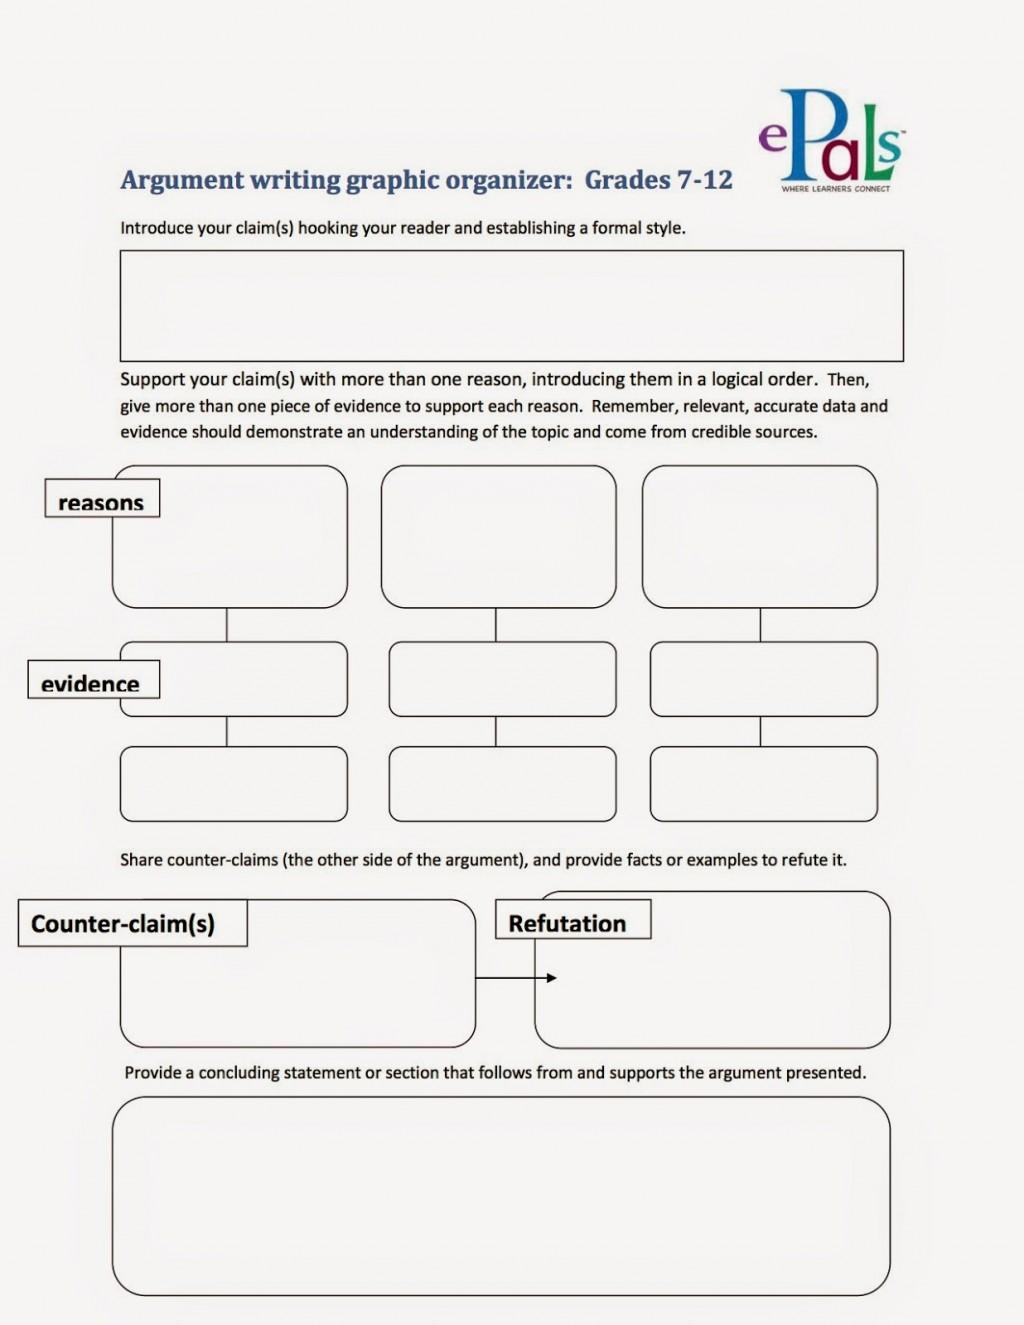 005 Argumentgraphicorganizer2bcopy Argument Essay Graphic Organizer Breathtaking Argumentative College Example Persuasive Template Large